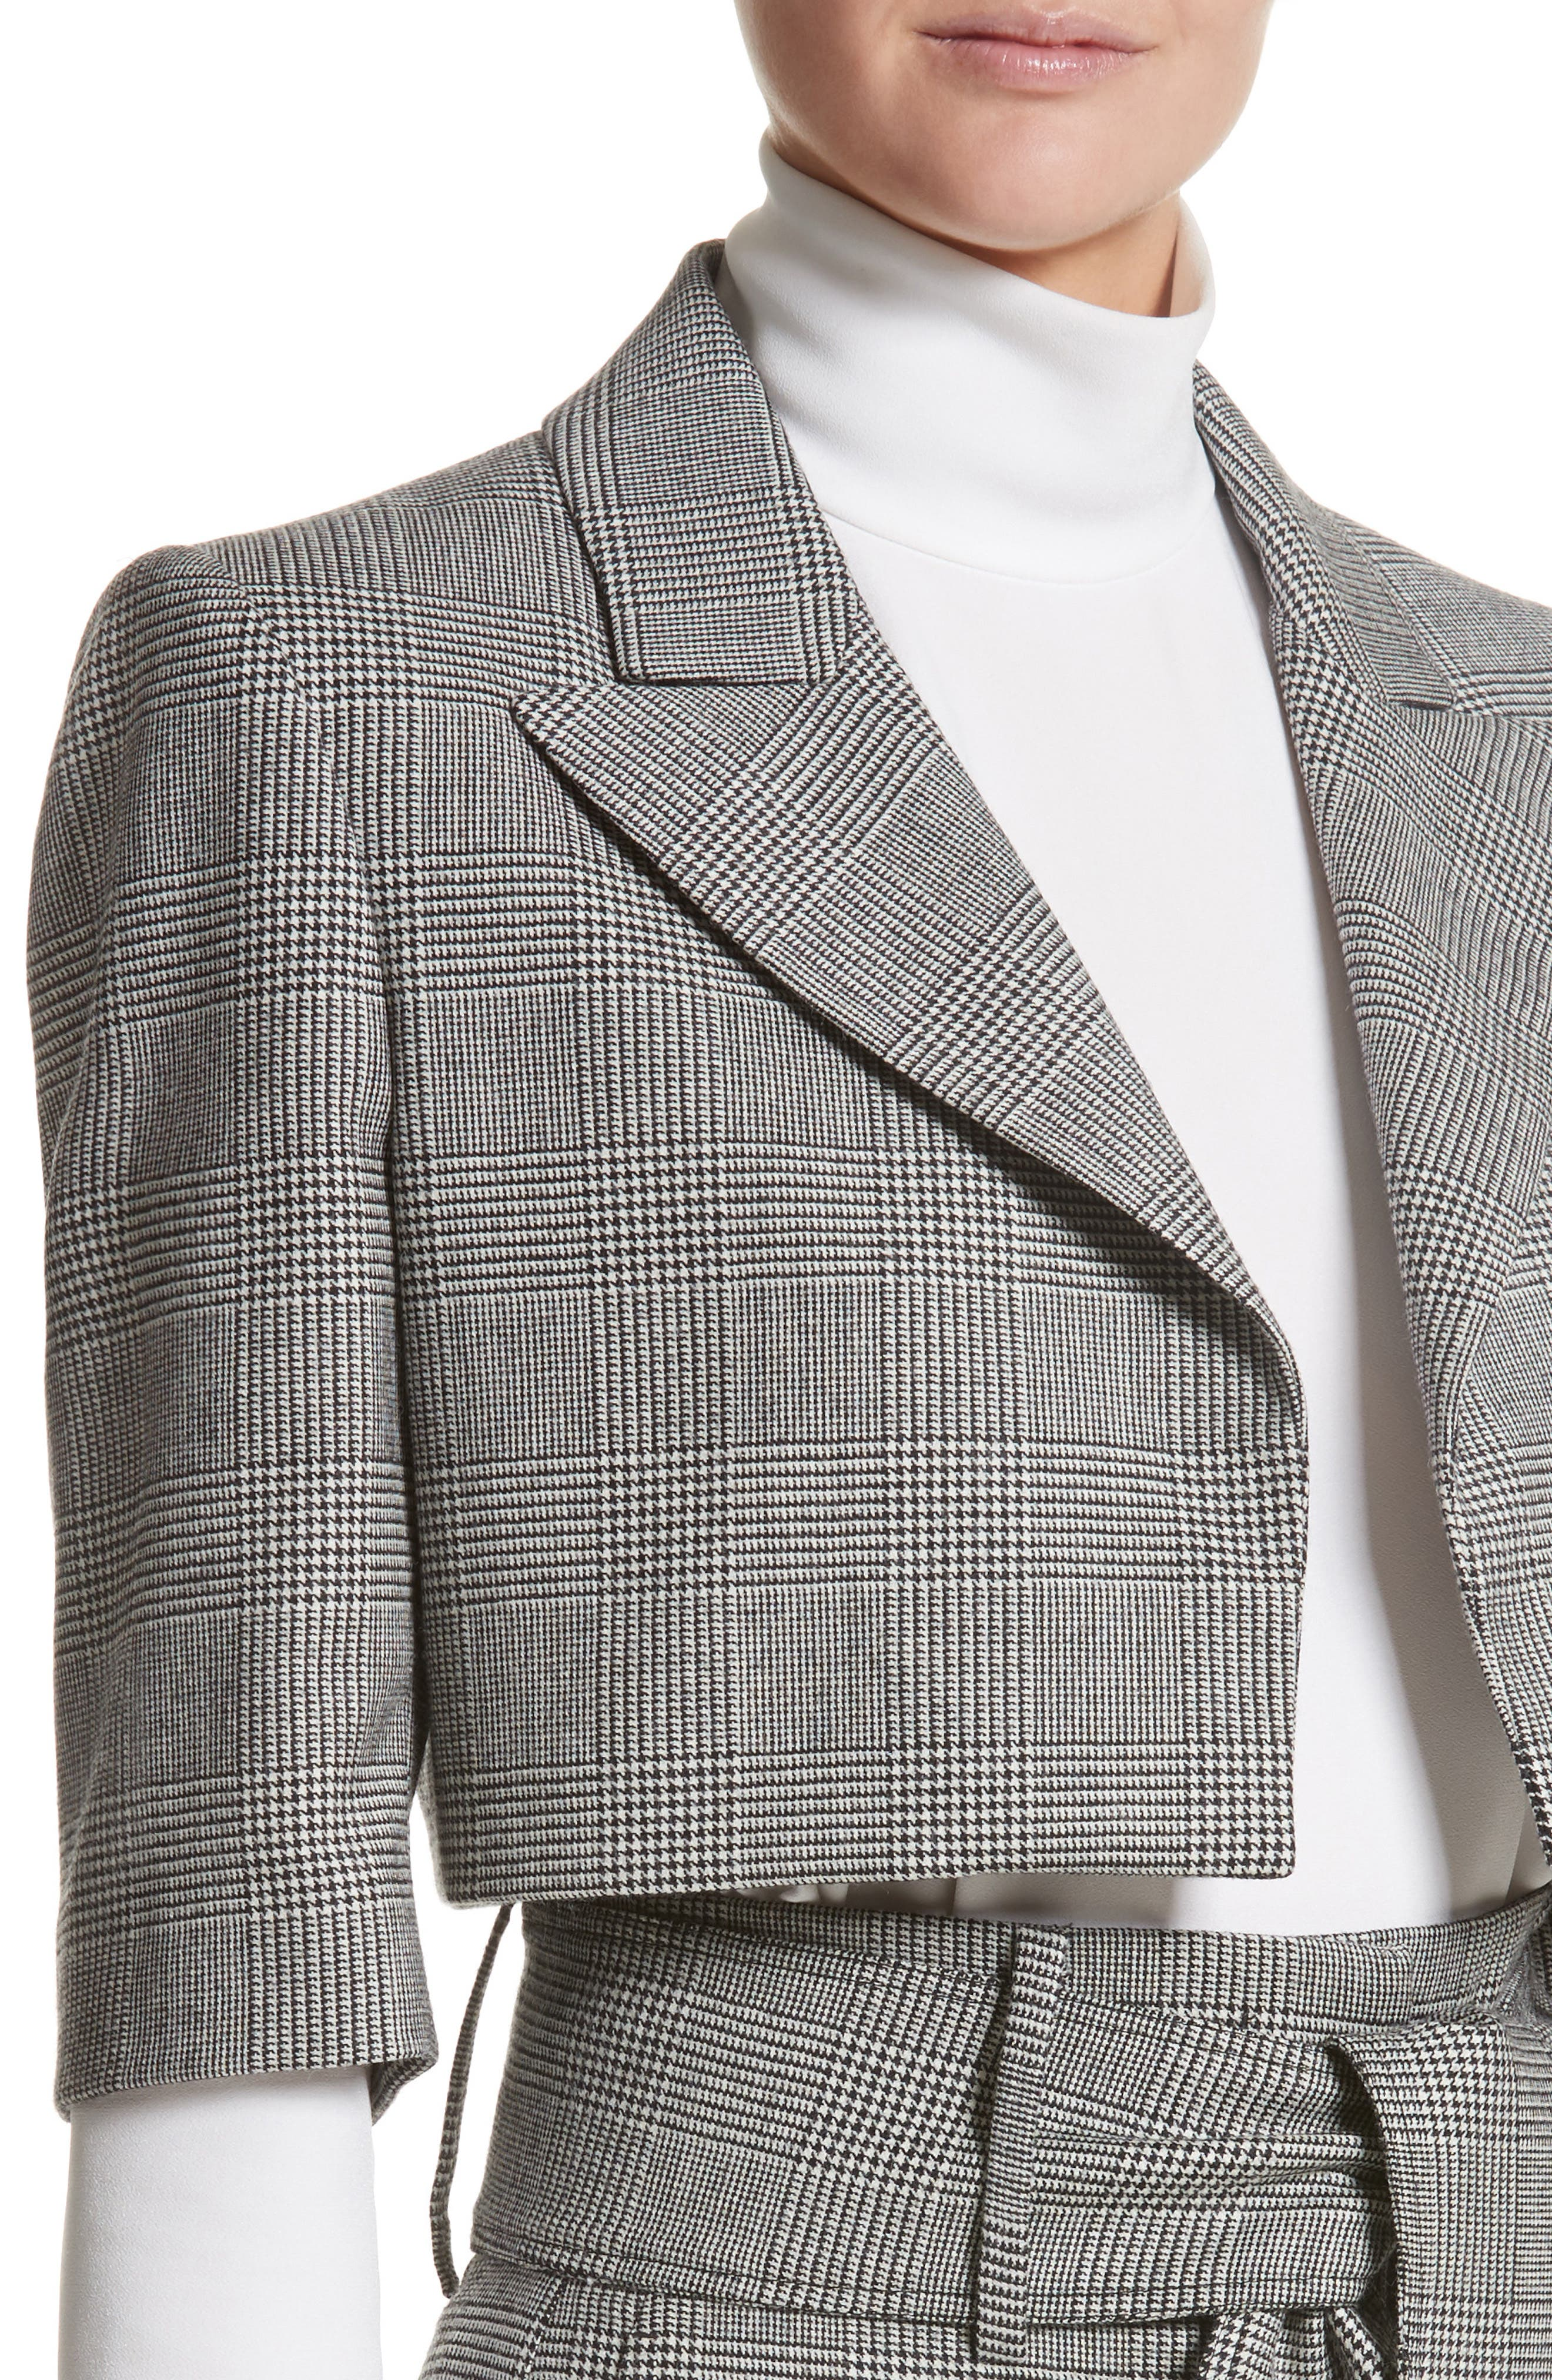 Glen Plaid Crop Jacket,                             Alternate thumbnail 6, color,                             Black/ White